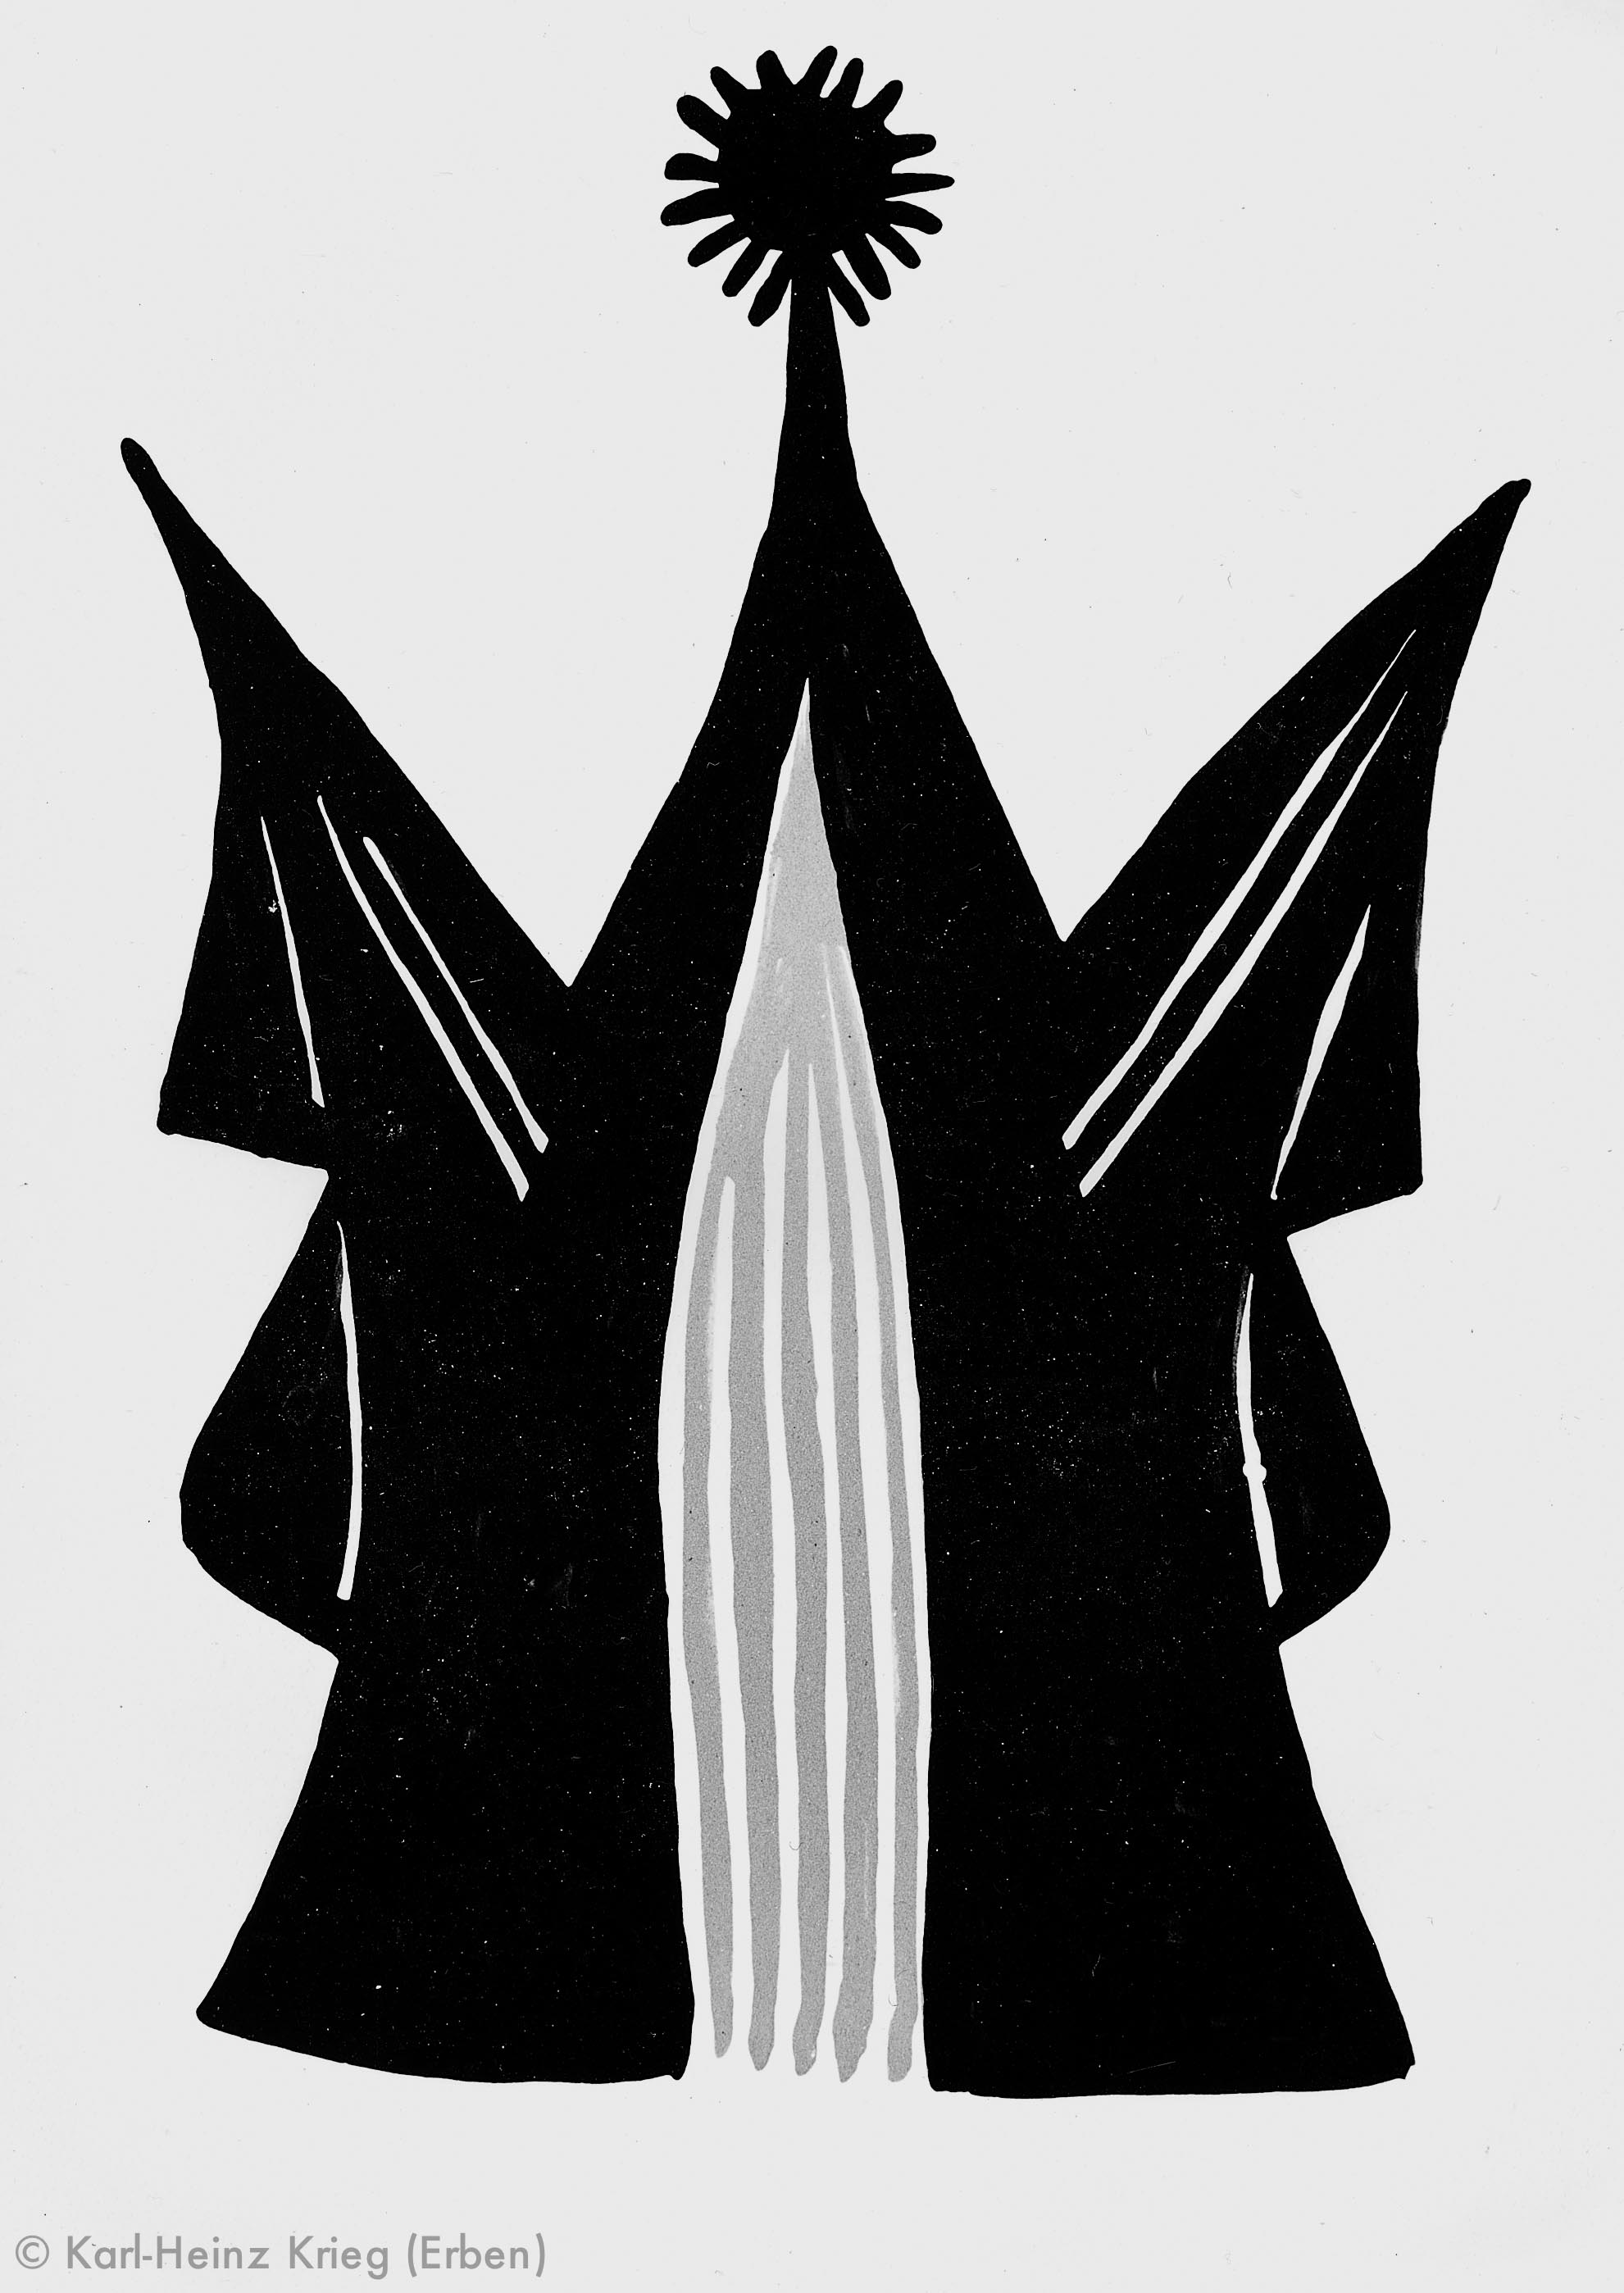 Pévé Zoumanigi Tégai, 1996 Acryl/Papier, grundiert 29,8 x 21,1 cm Werknr. 39-1996/117